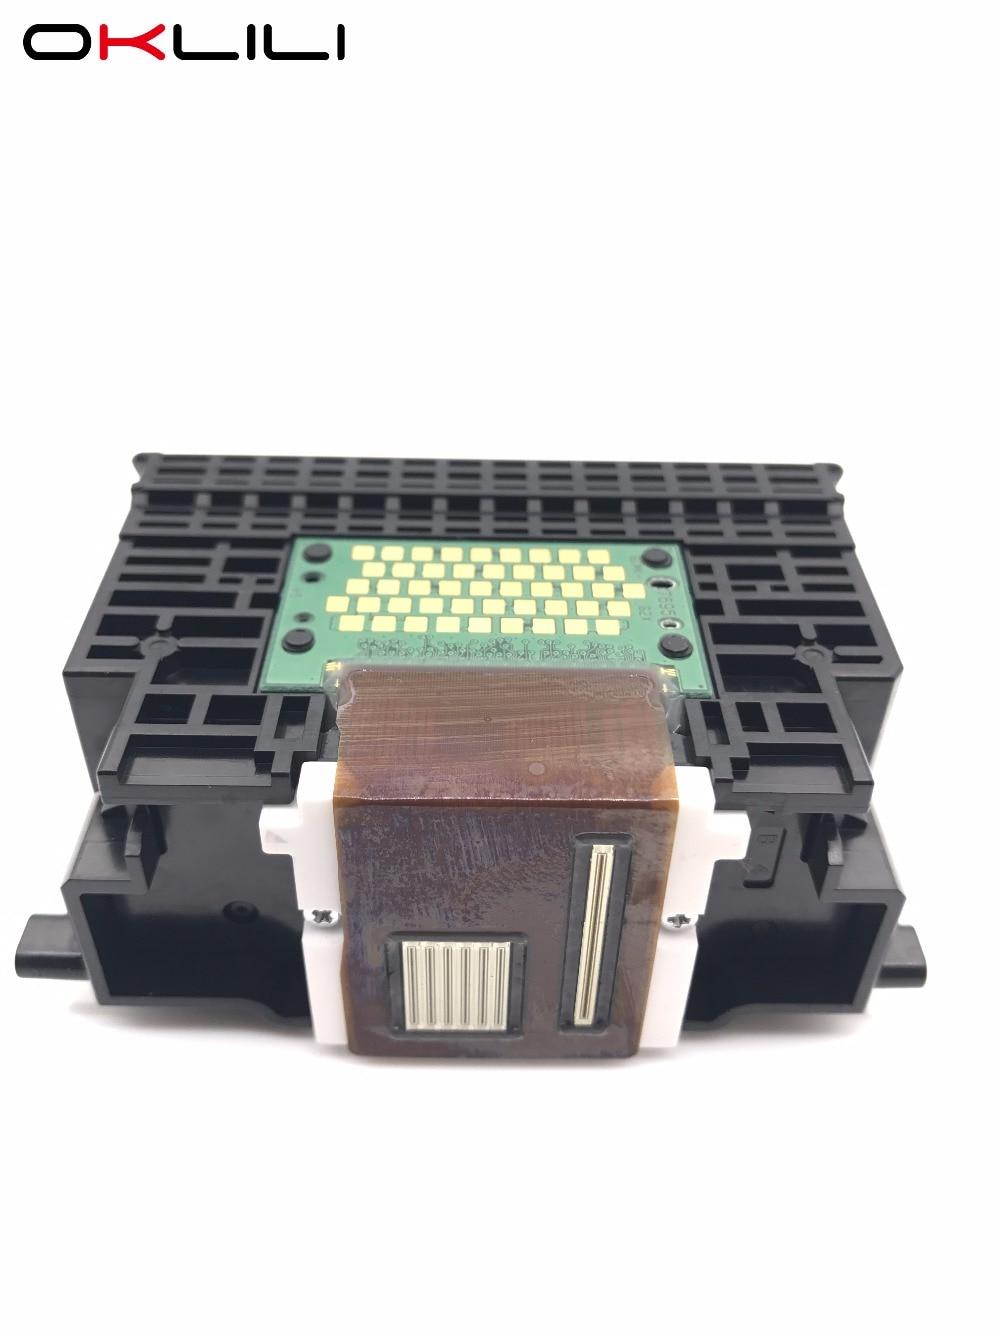 OKLILI ORIGINAL QY6-0075 QY6-0075-000 Printhead Print Head Printer Head For Canon IP5300 MP810 IP4500 MP610 MX850